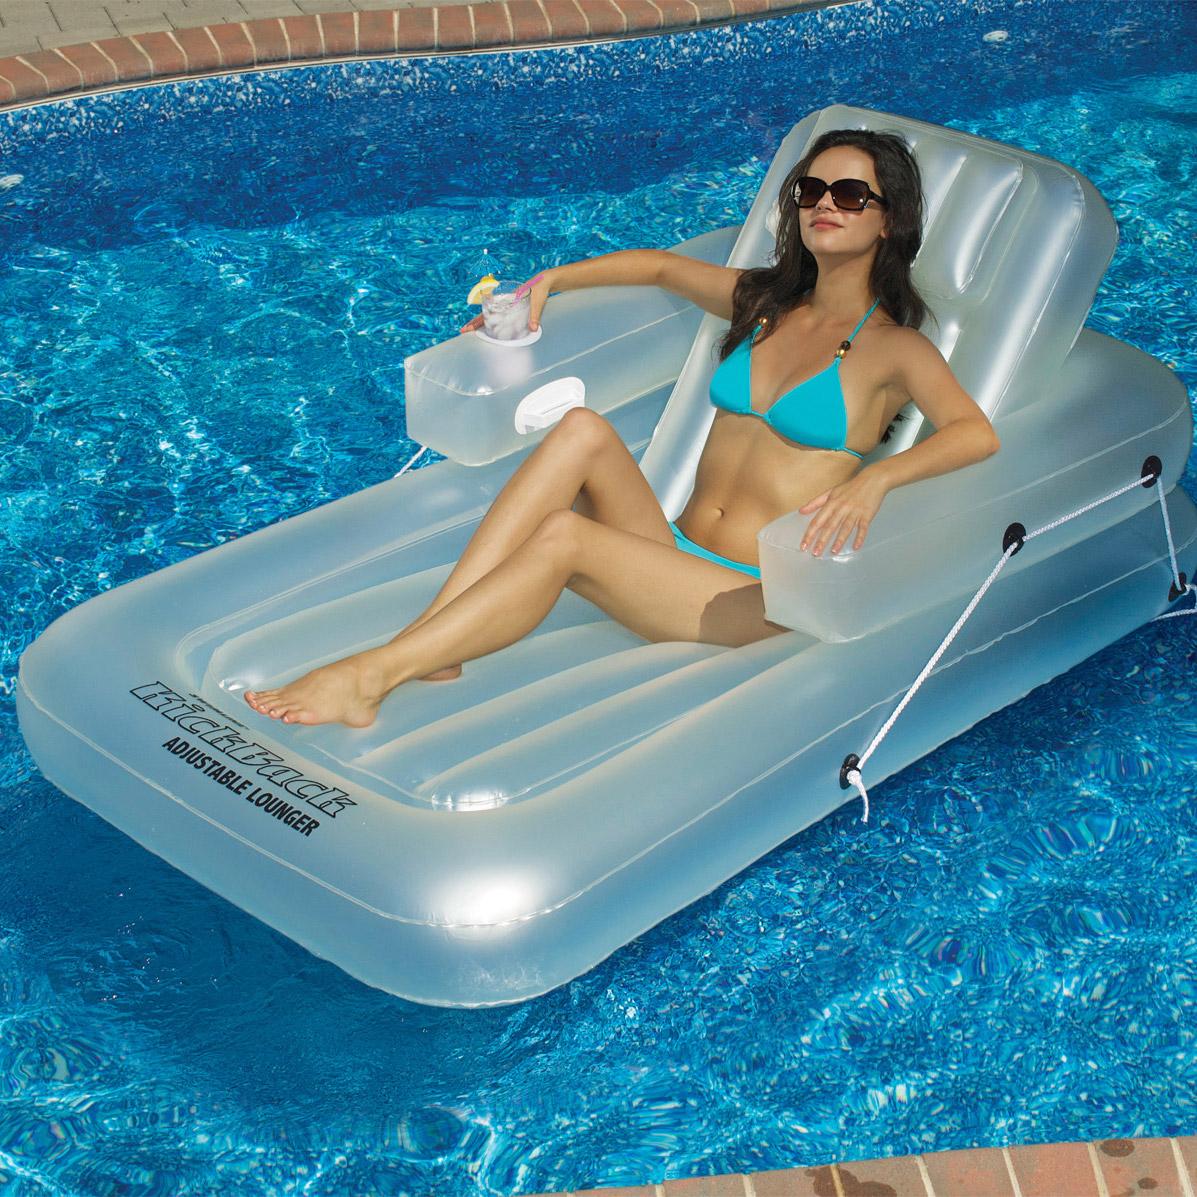 Poolmaster Adjustable Chaise Floating Lounge Splash